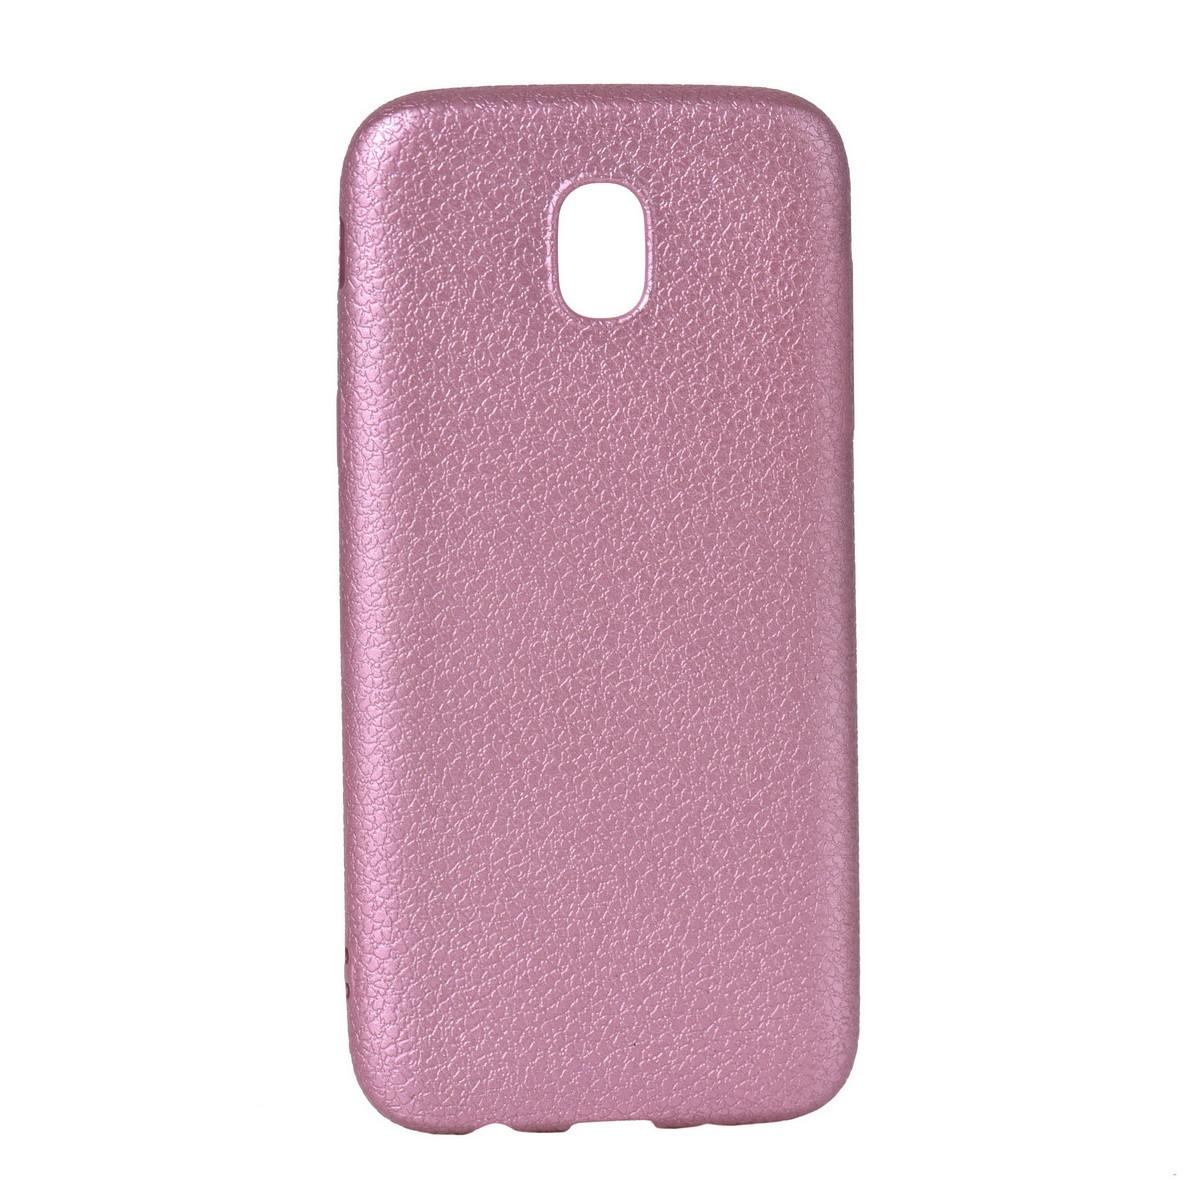 Чехол для Samsung Galaxy J5 (2017) J530 back cover Leather oem Pink